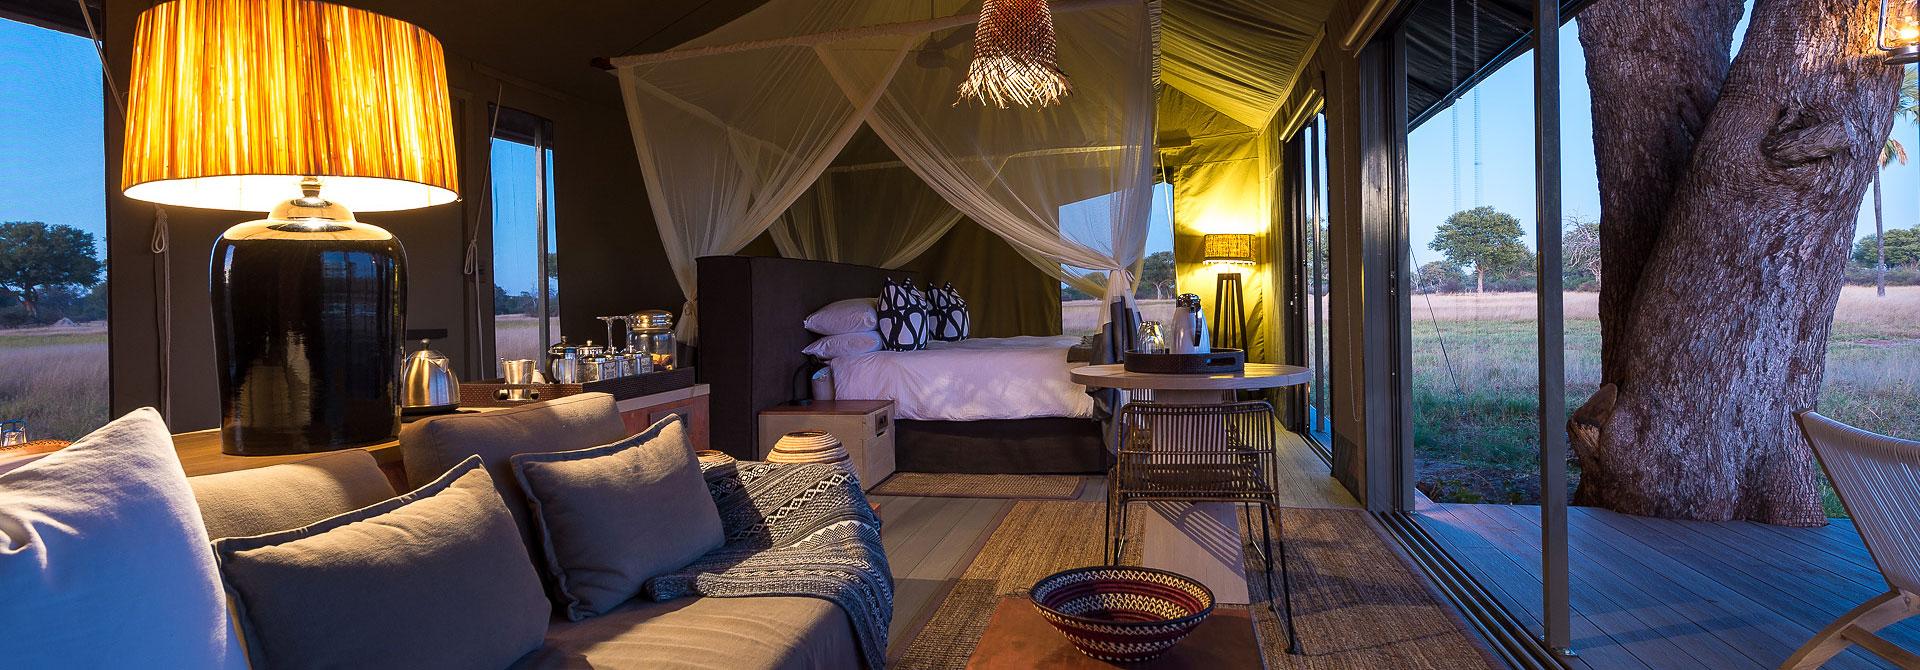 Zimbabwe-Linkwasha-Camp